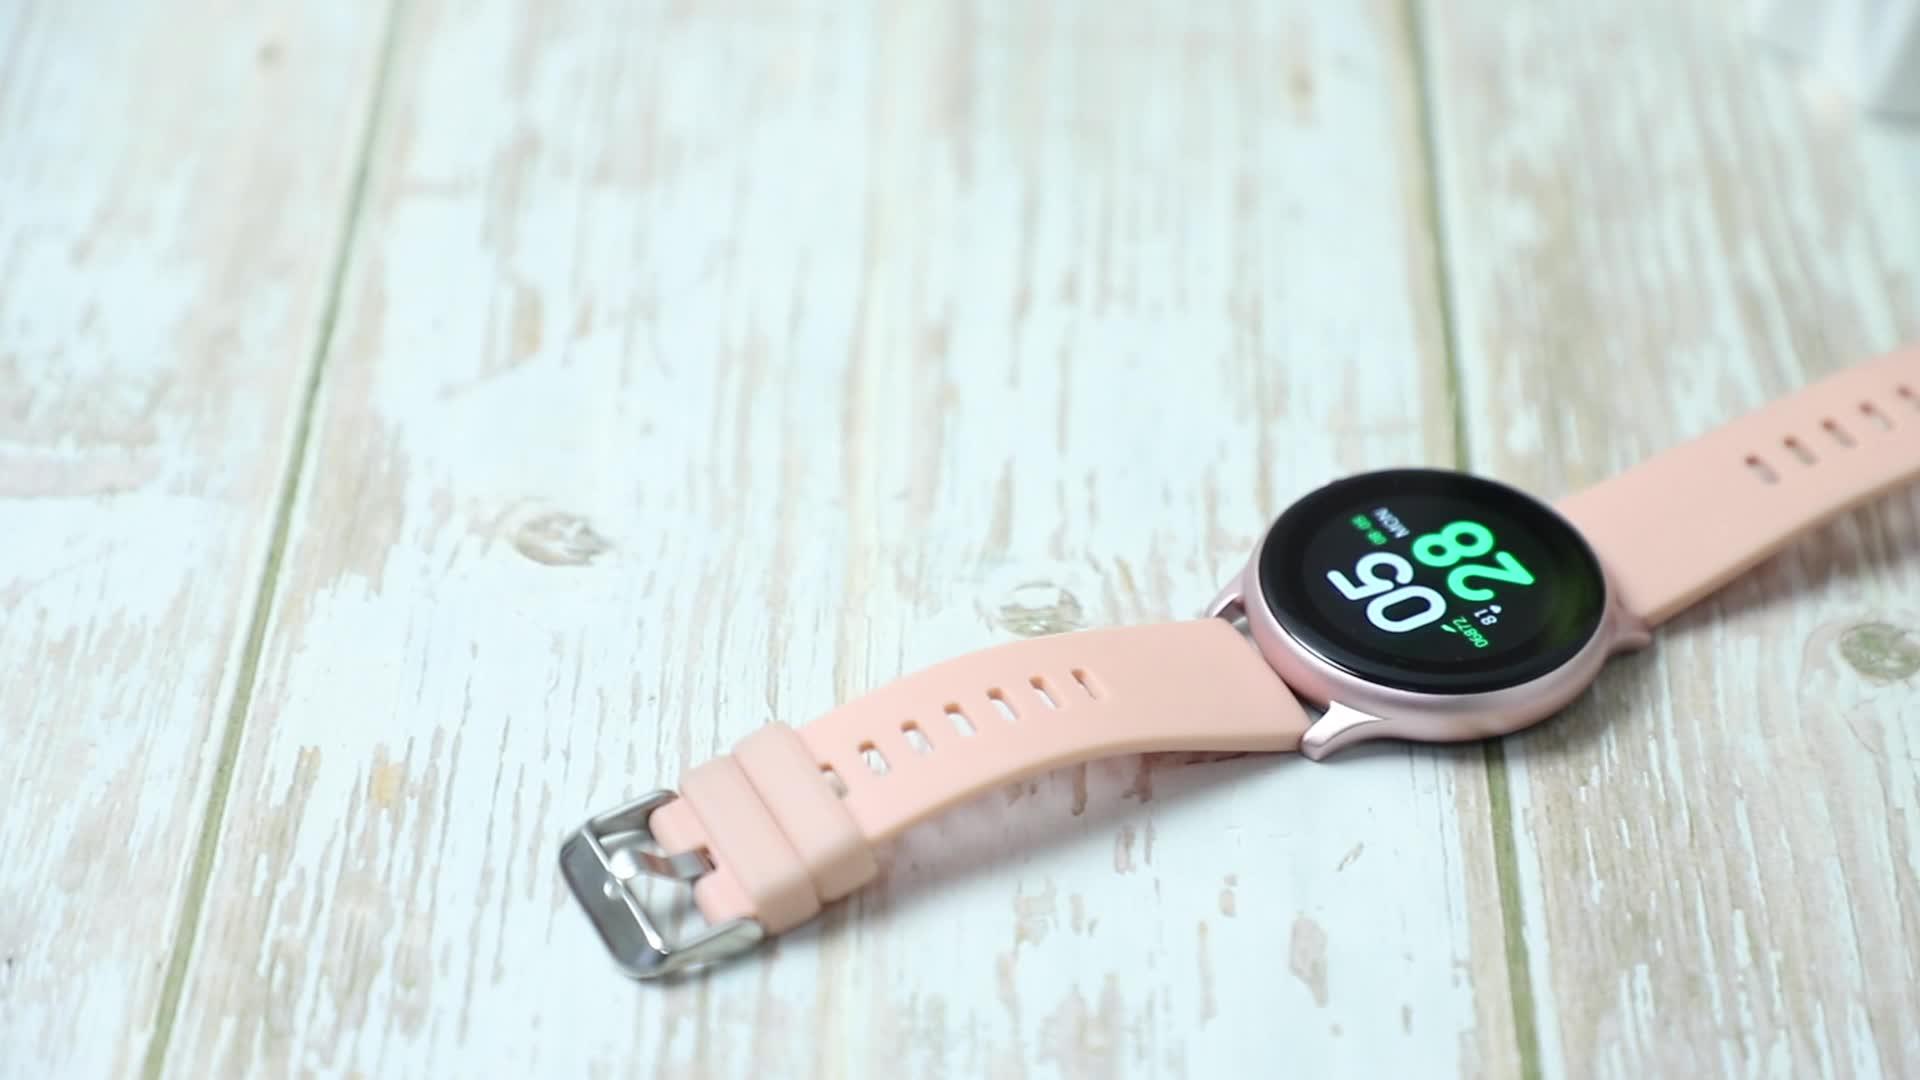 2020 new arrivals women beauty หน้าจอสัมผัส AMOLED display นาฬิกาข้อมือ 7 วันต่อ charge